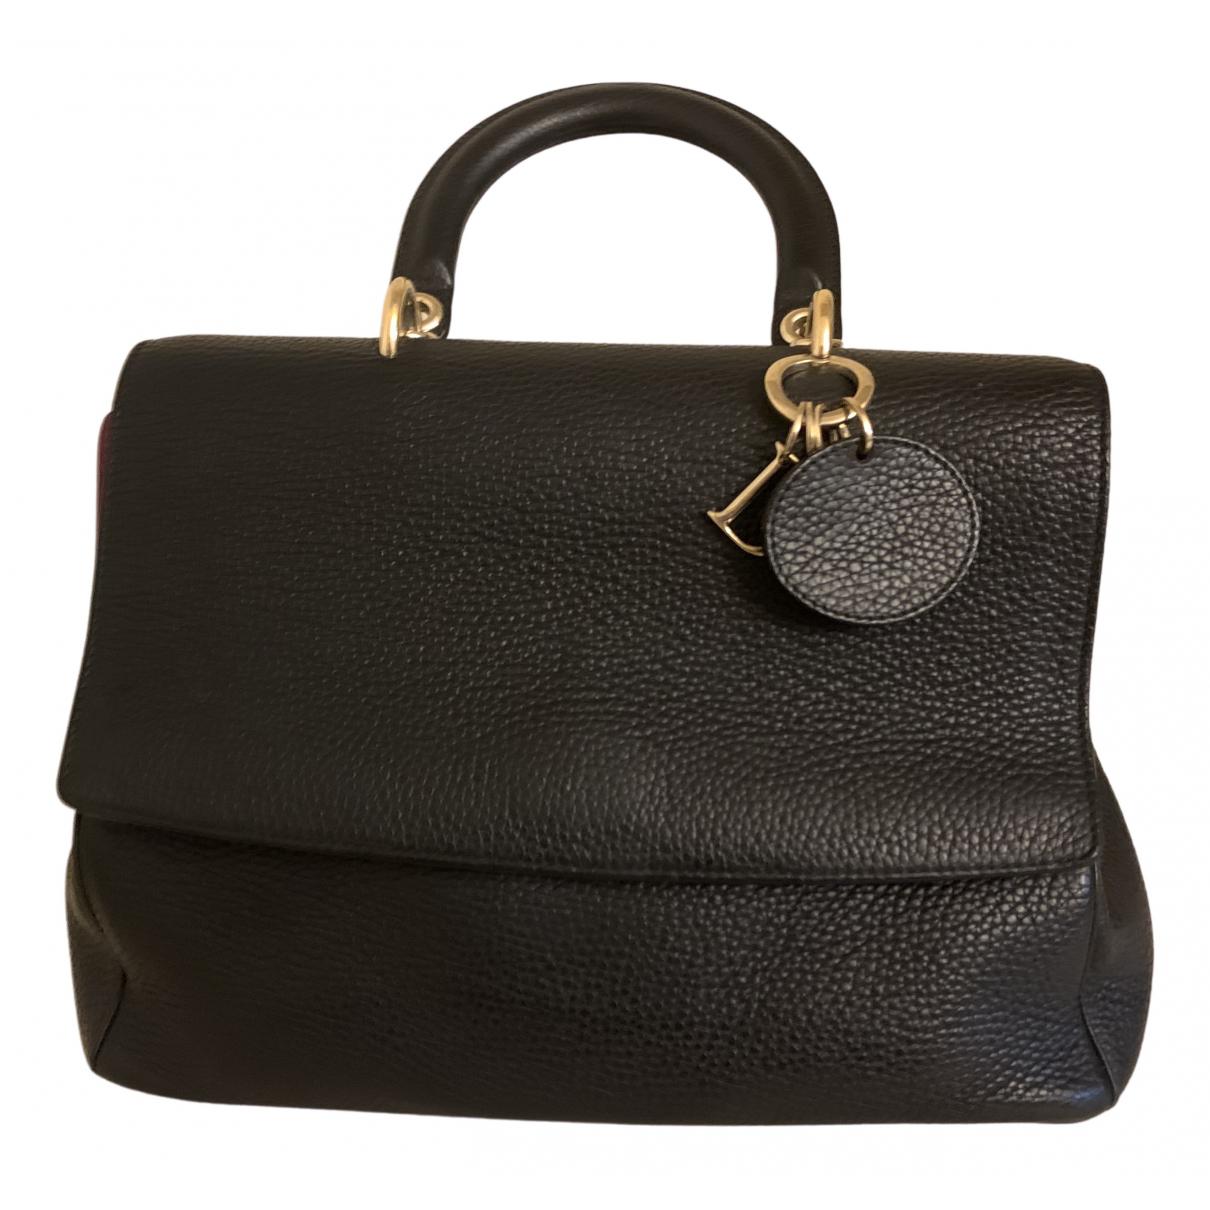 Dior Diorissimo Black Patent leather handbag for Women \N